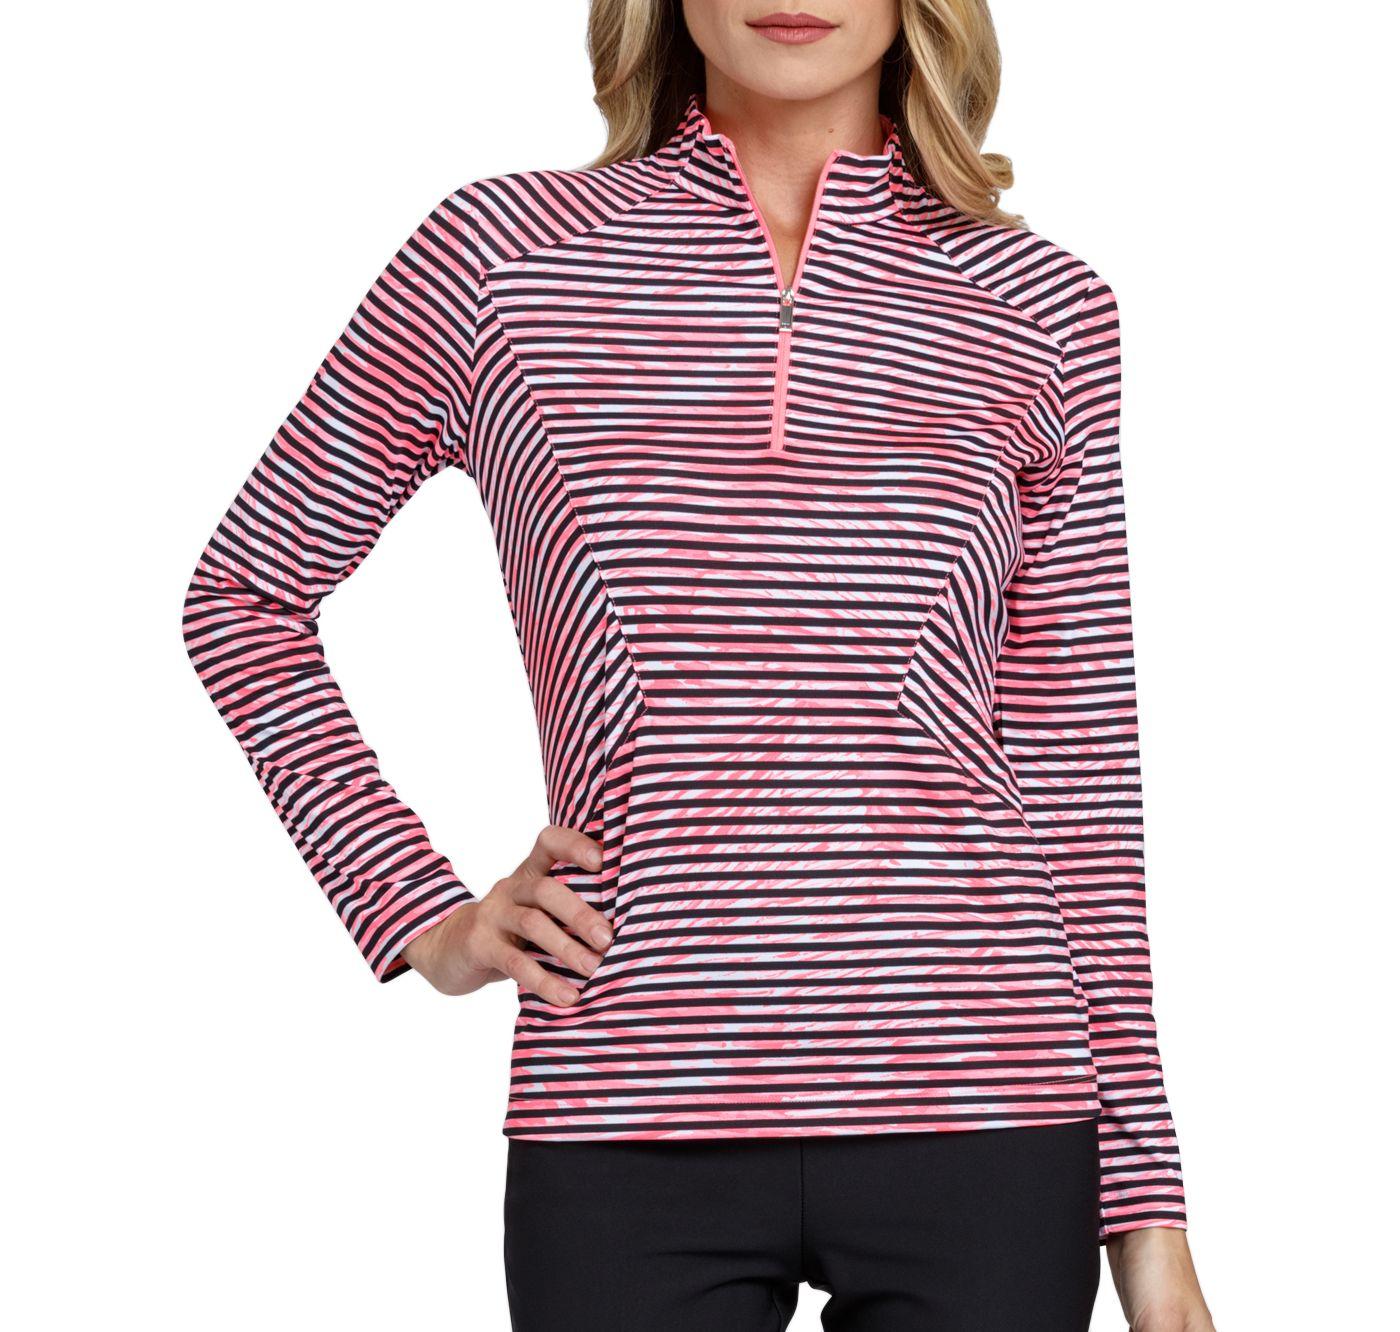 Tail Women's Stylized Striped Mock Neck Golf Top